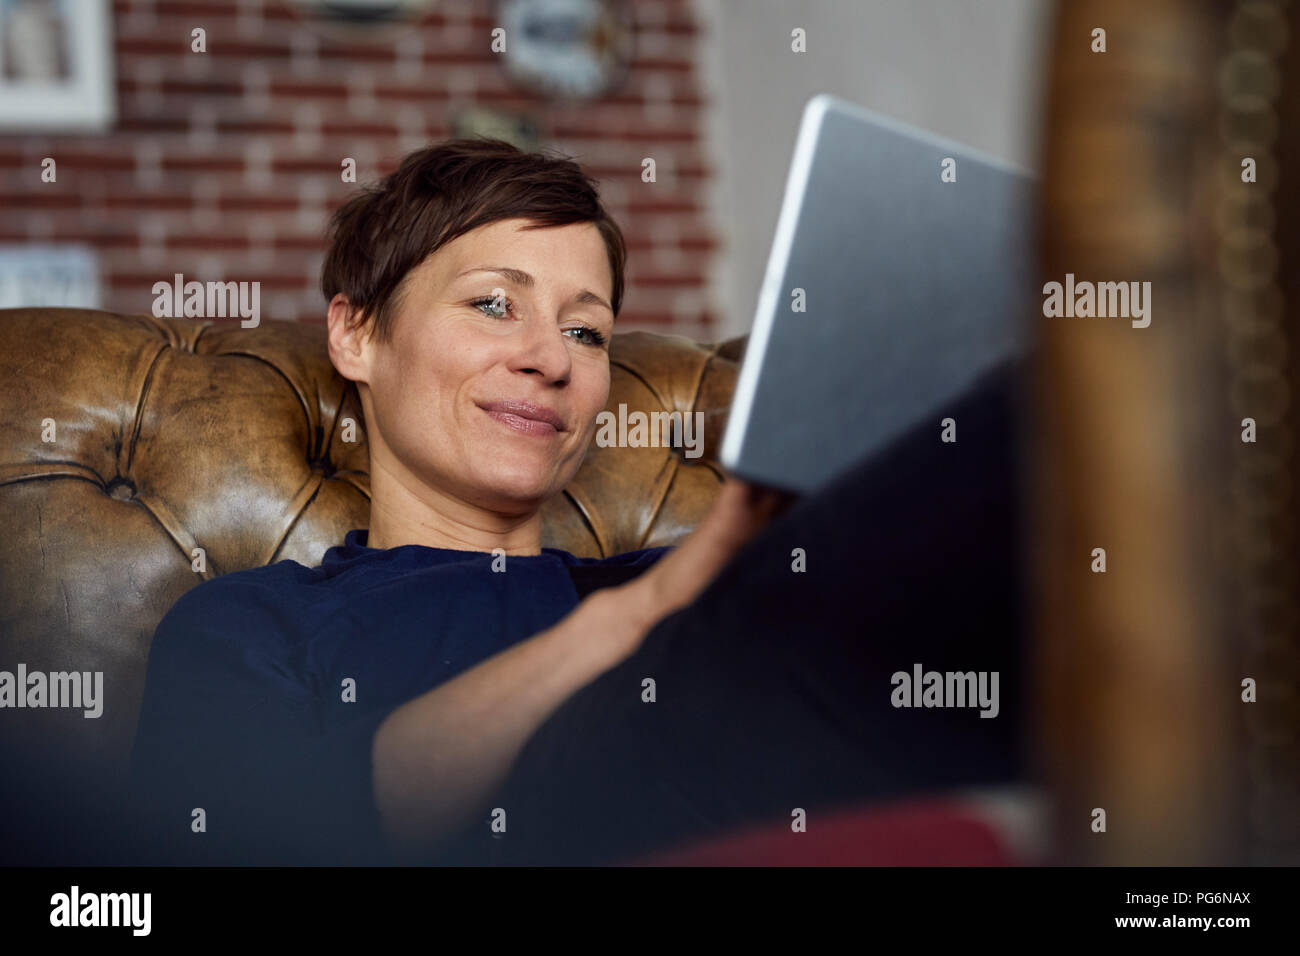 Woamn sitting on sofa at home, using digital tablet - Stock Image